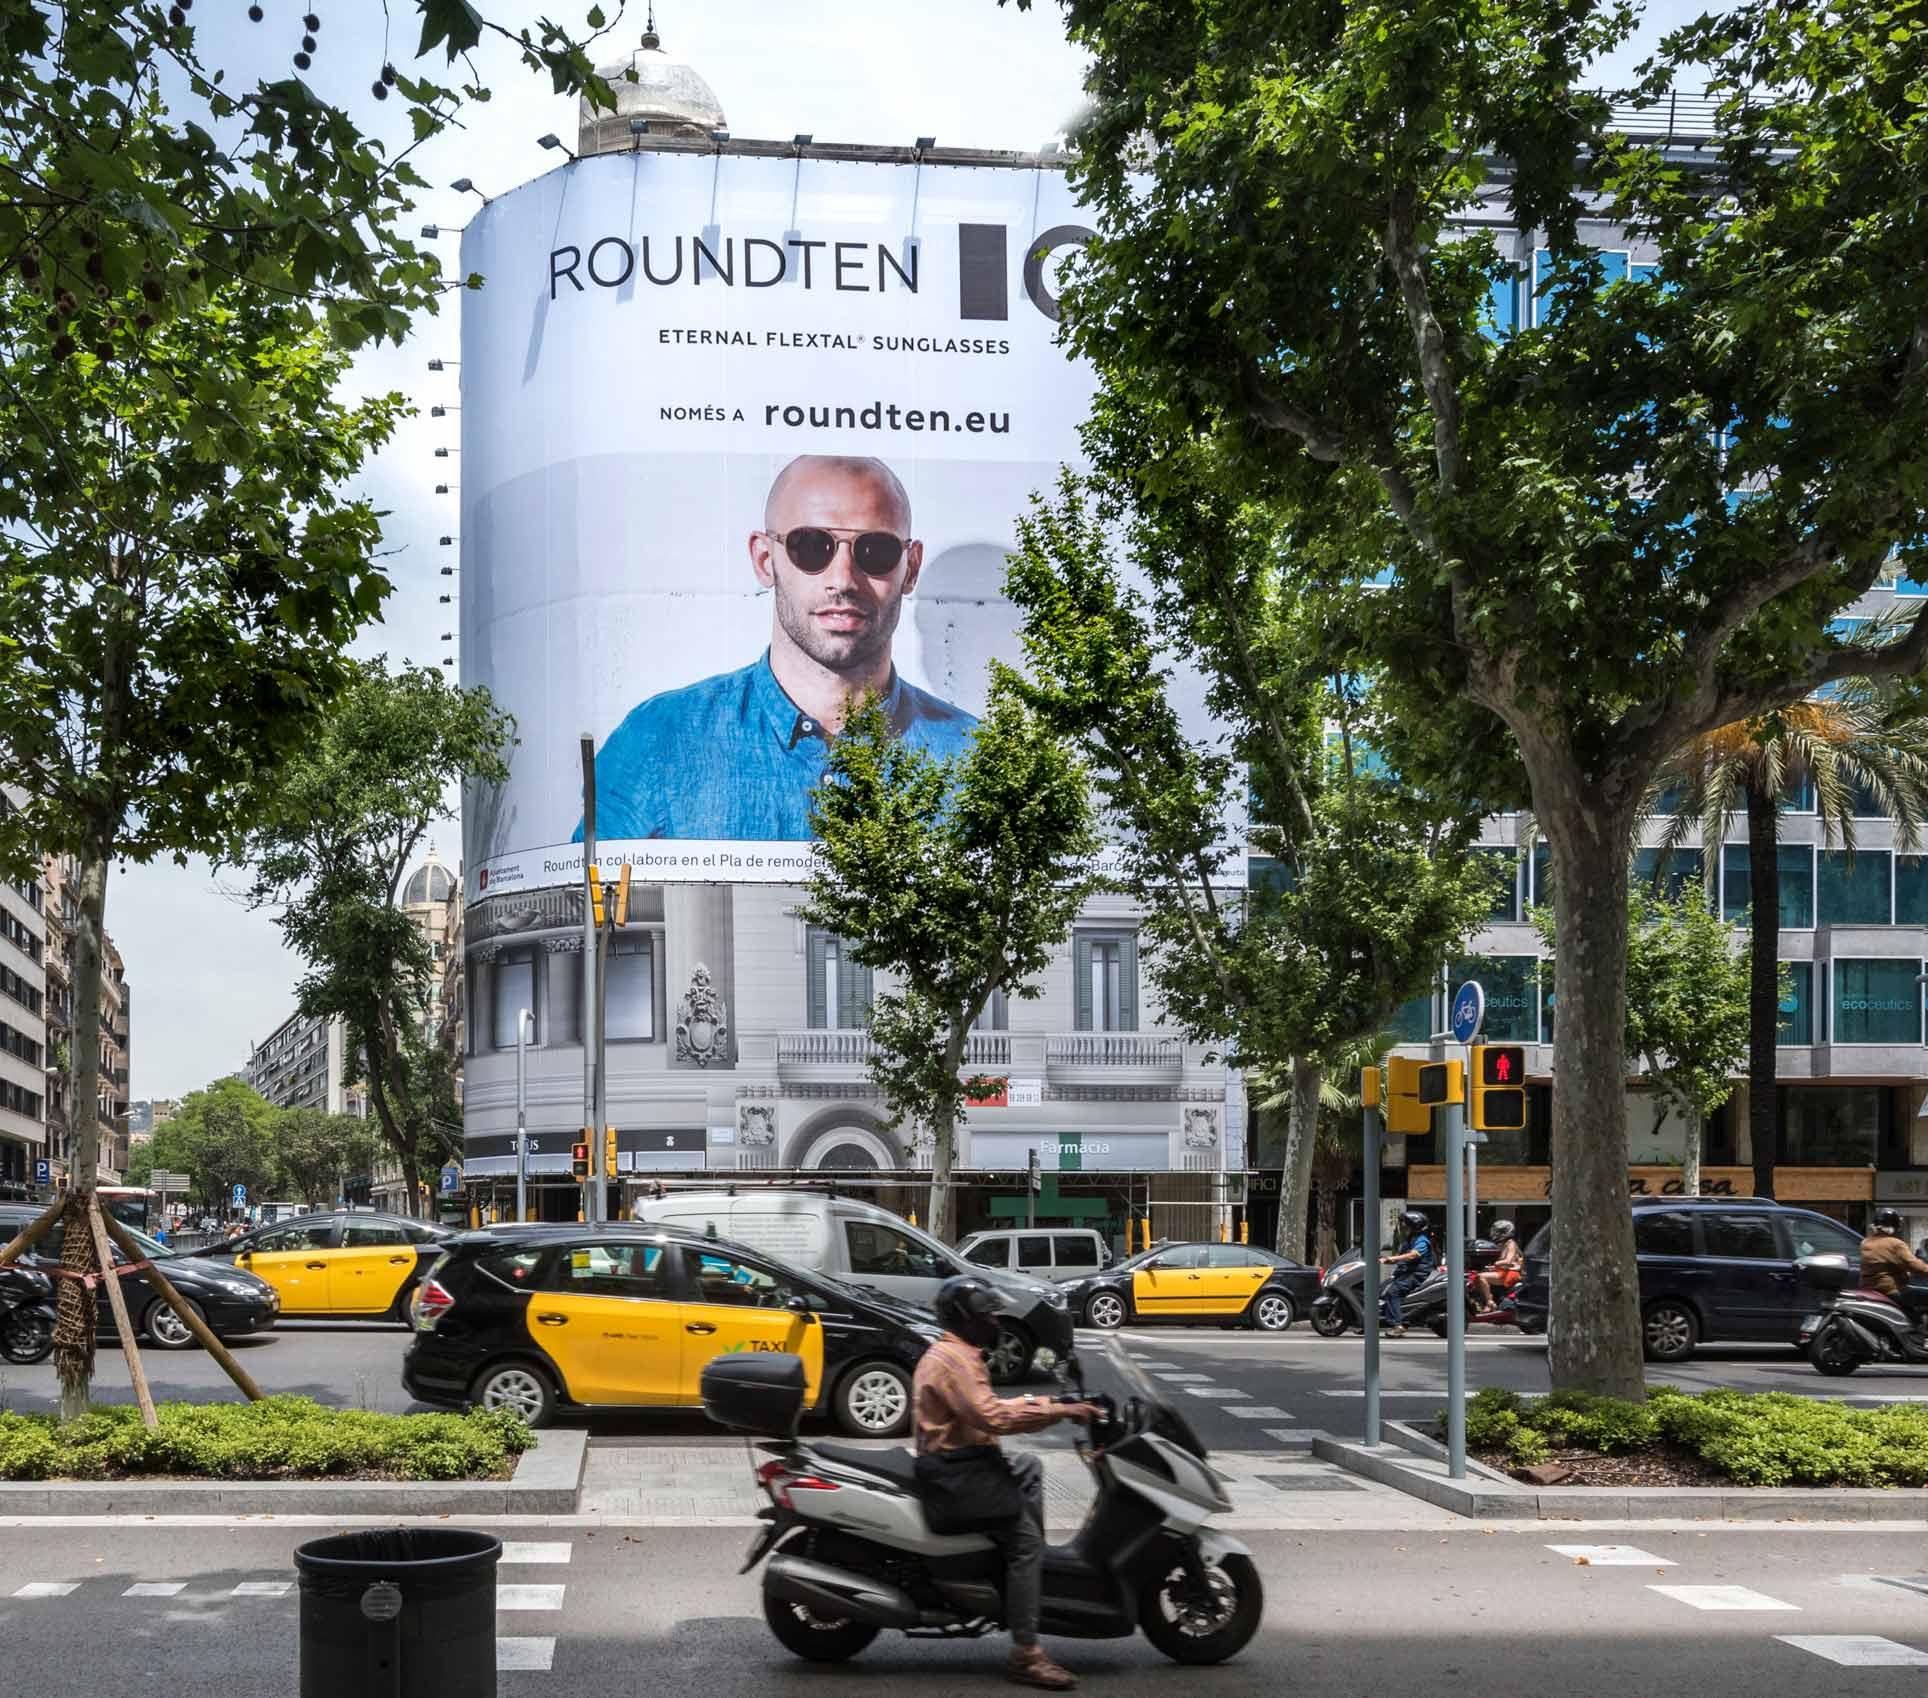 lona-publicitaria-barcelona-avenida-diagonal-478-roundten-javier-mascherano-frontal-vsa-comunicacion